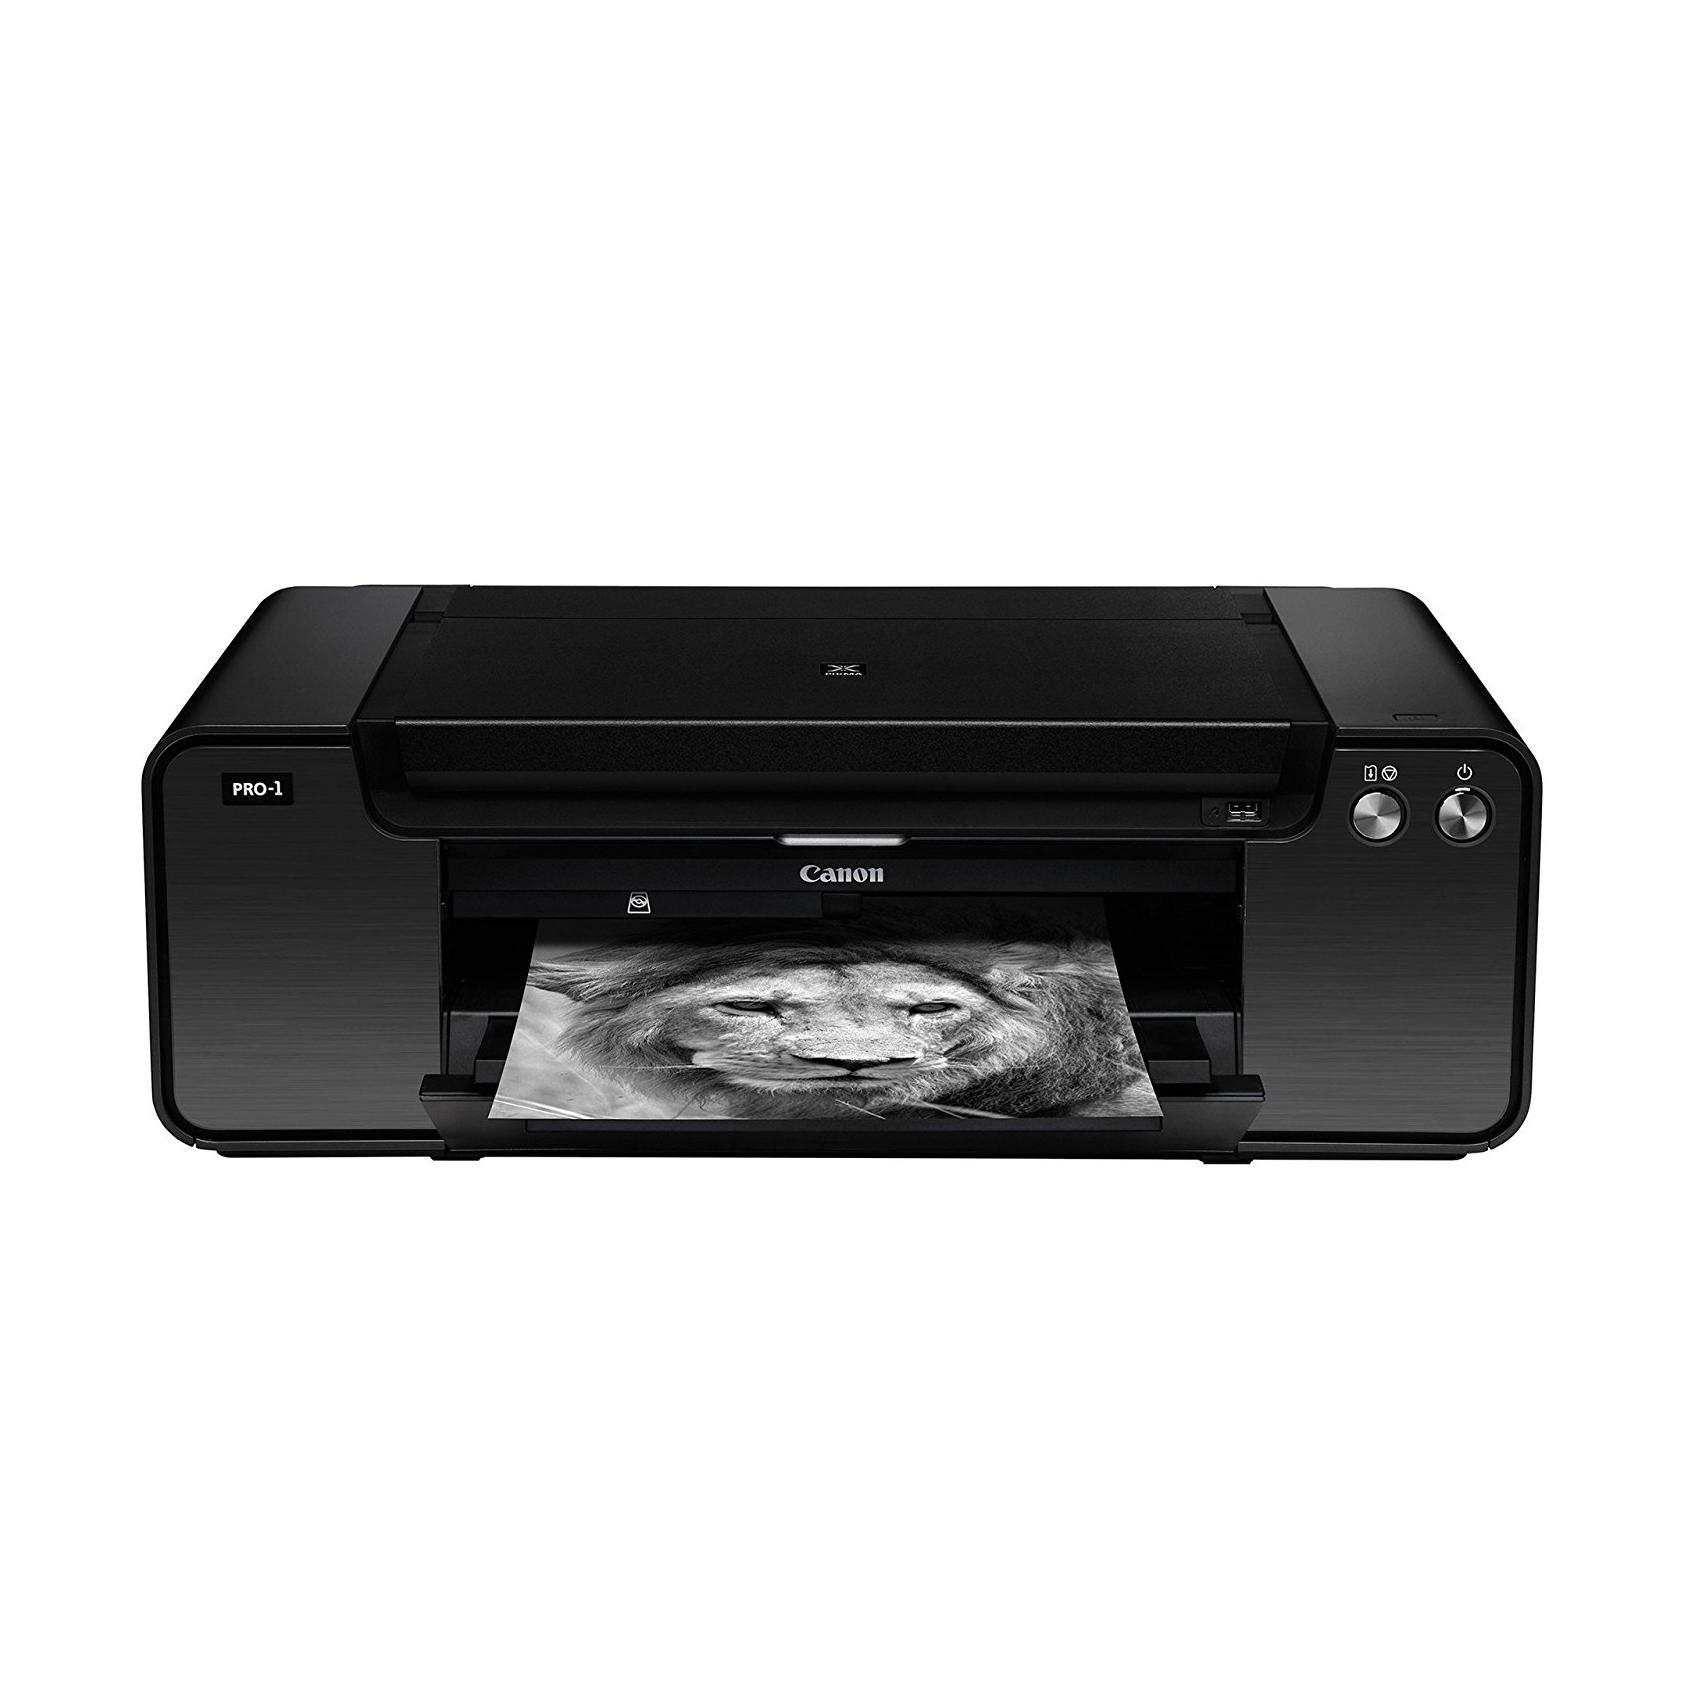 Canon PIXMA PRO-1 Professional Inkjet Printer